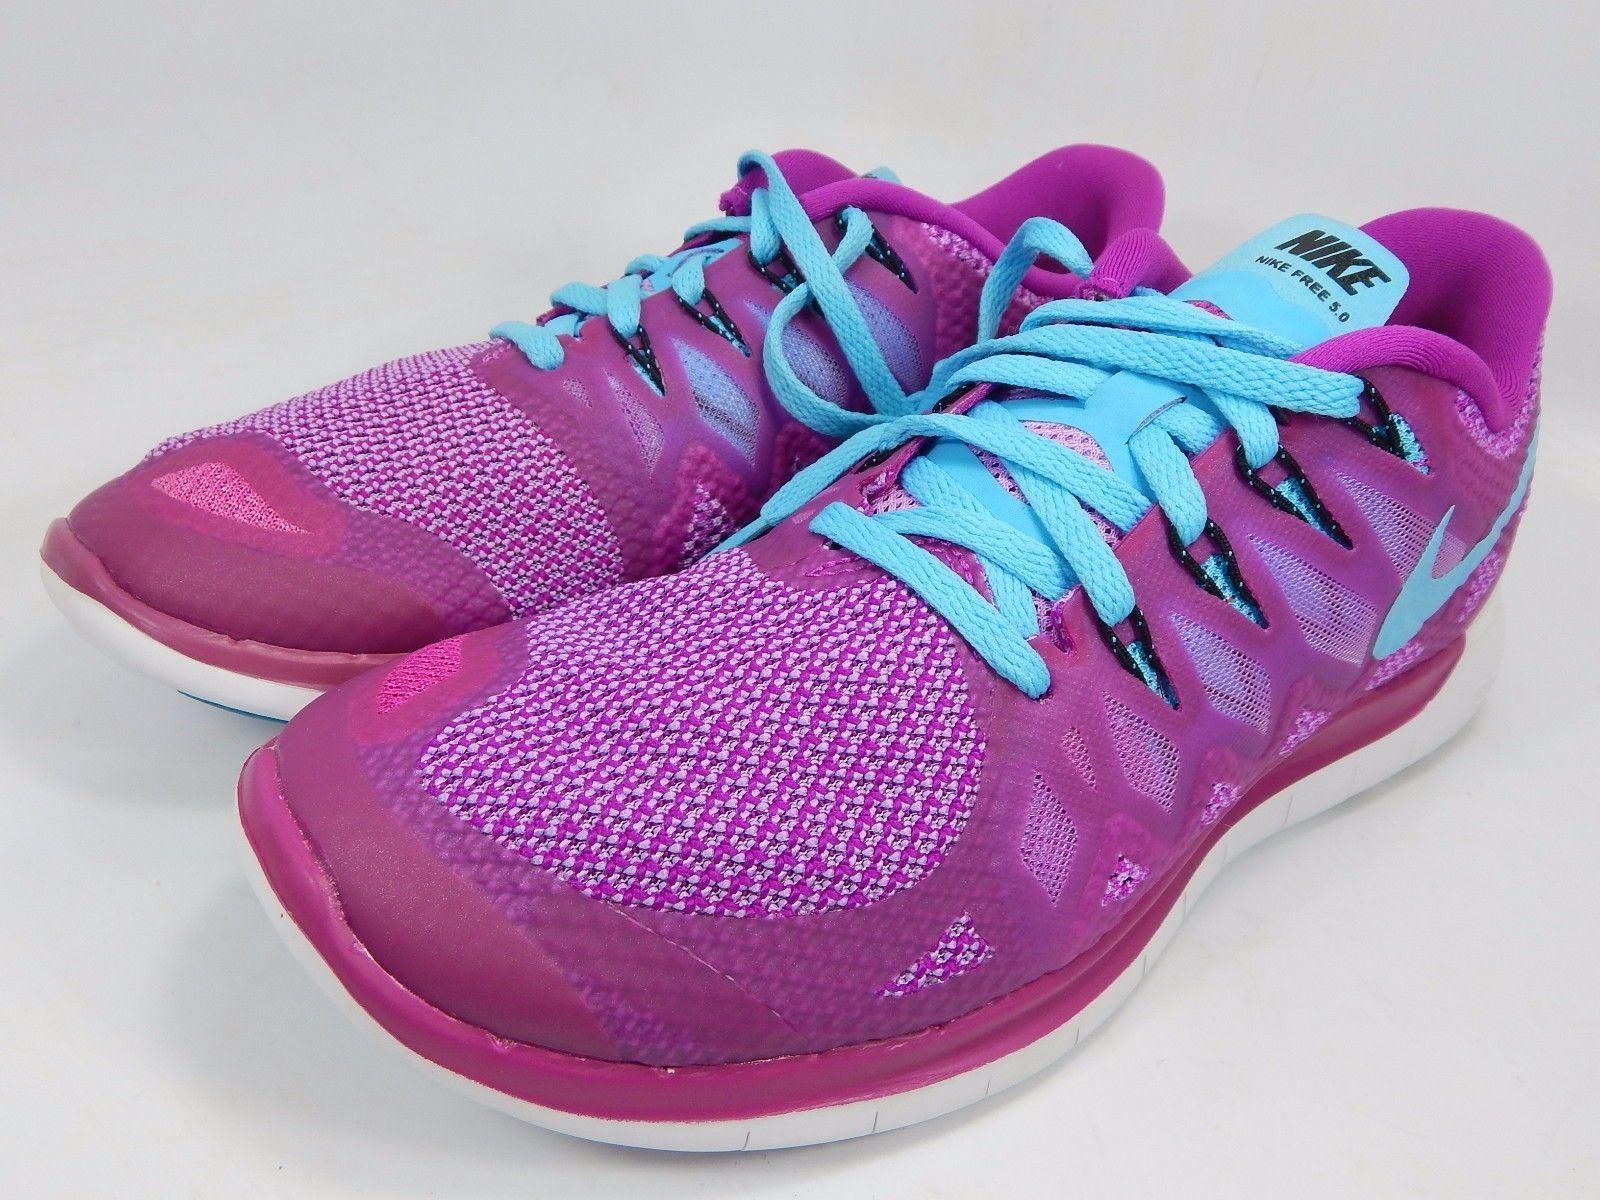 MISMATCH Nike Free Run 5.0 Women's Shoes Size 9.5 M B Left & Size 8 M B Right